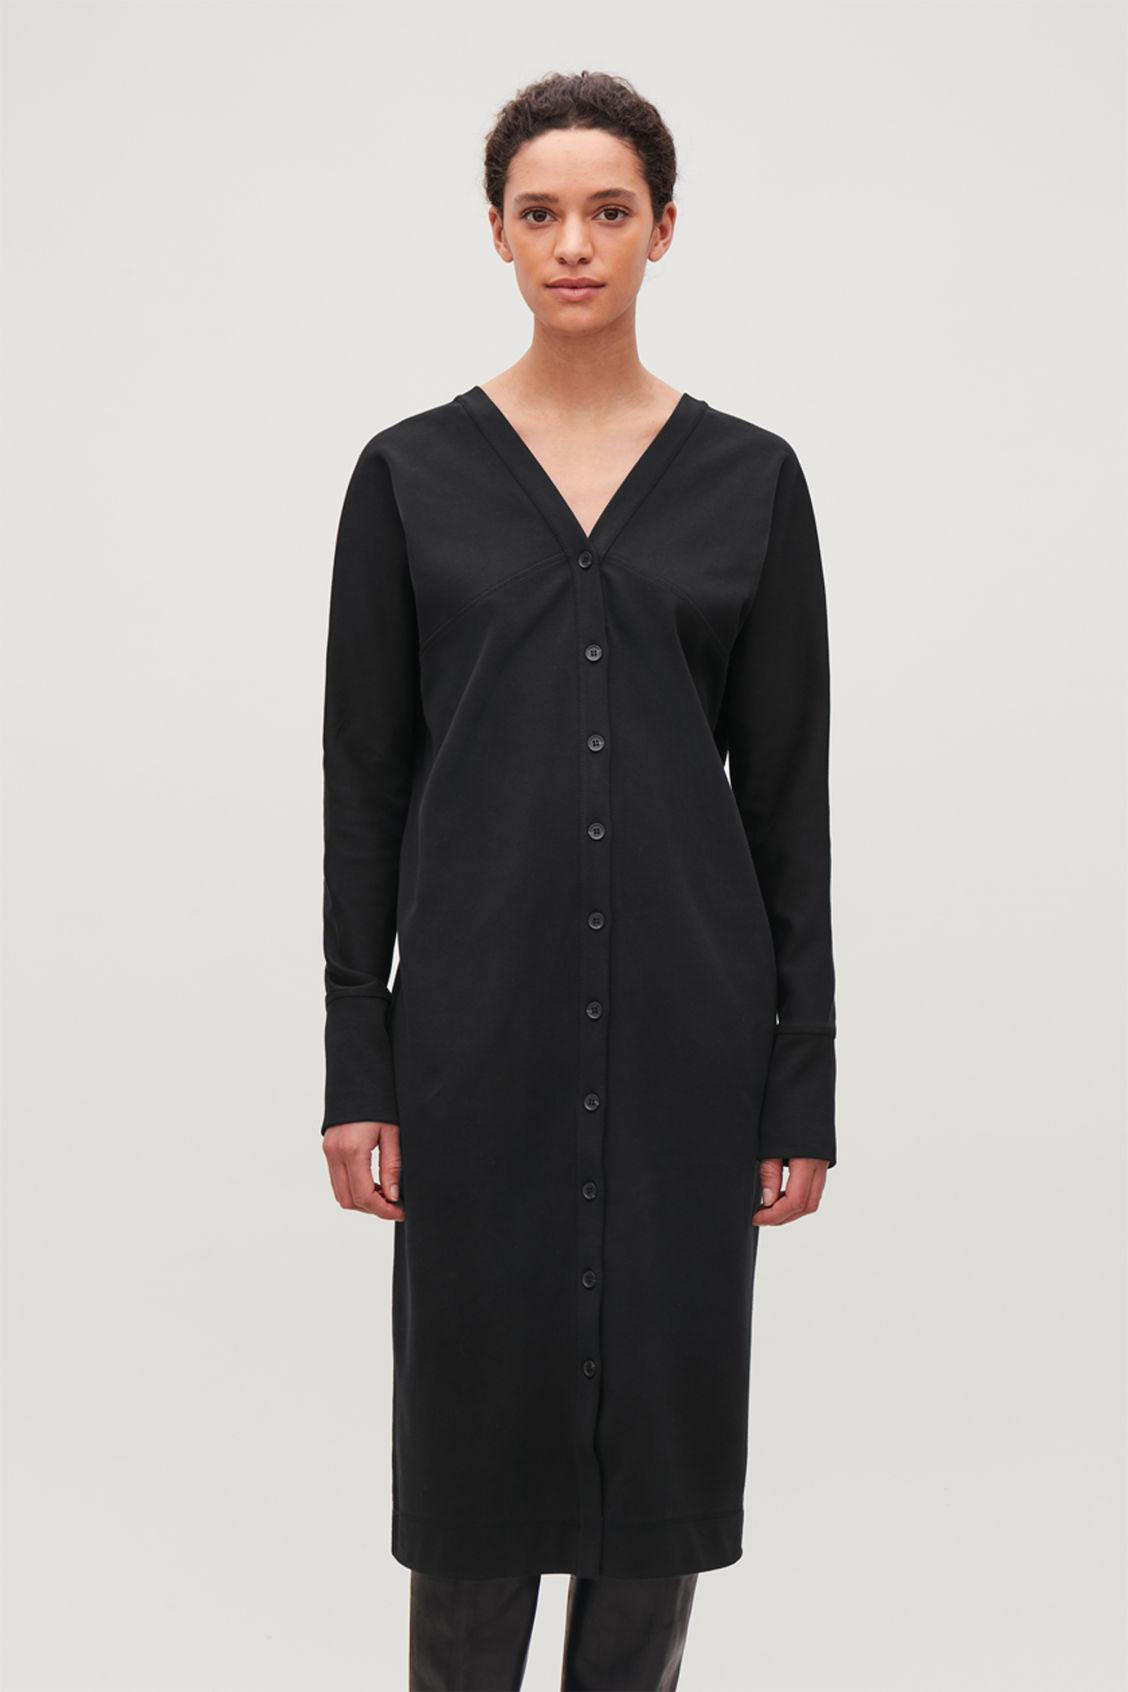 d6290366cb Black Deep V Neck Dress - Dress Foto and Picture